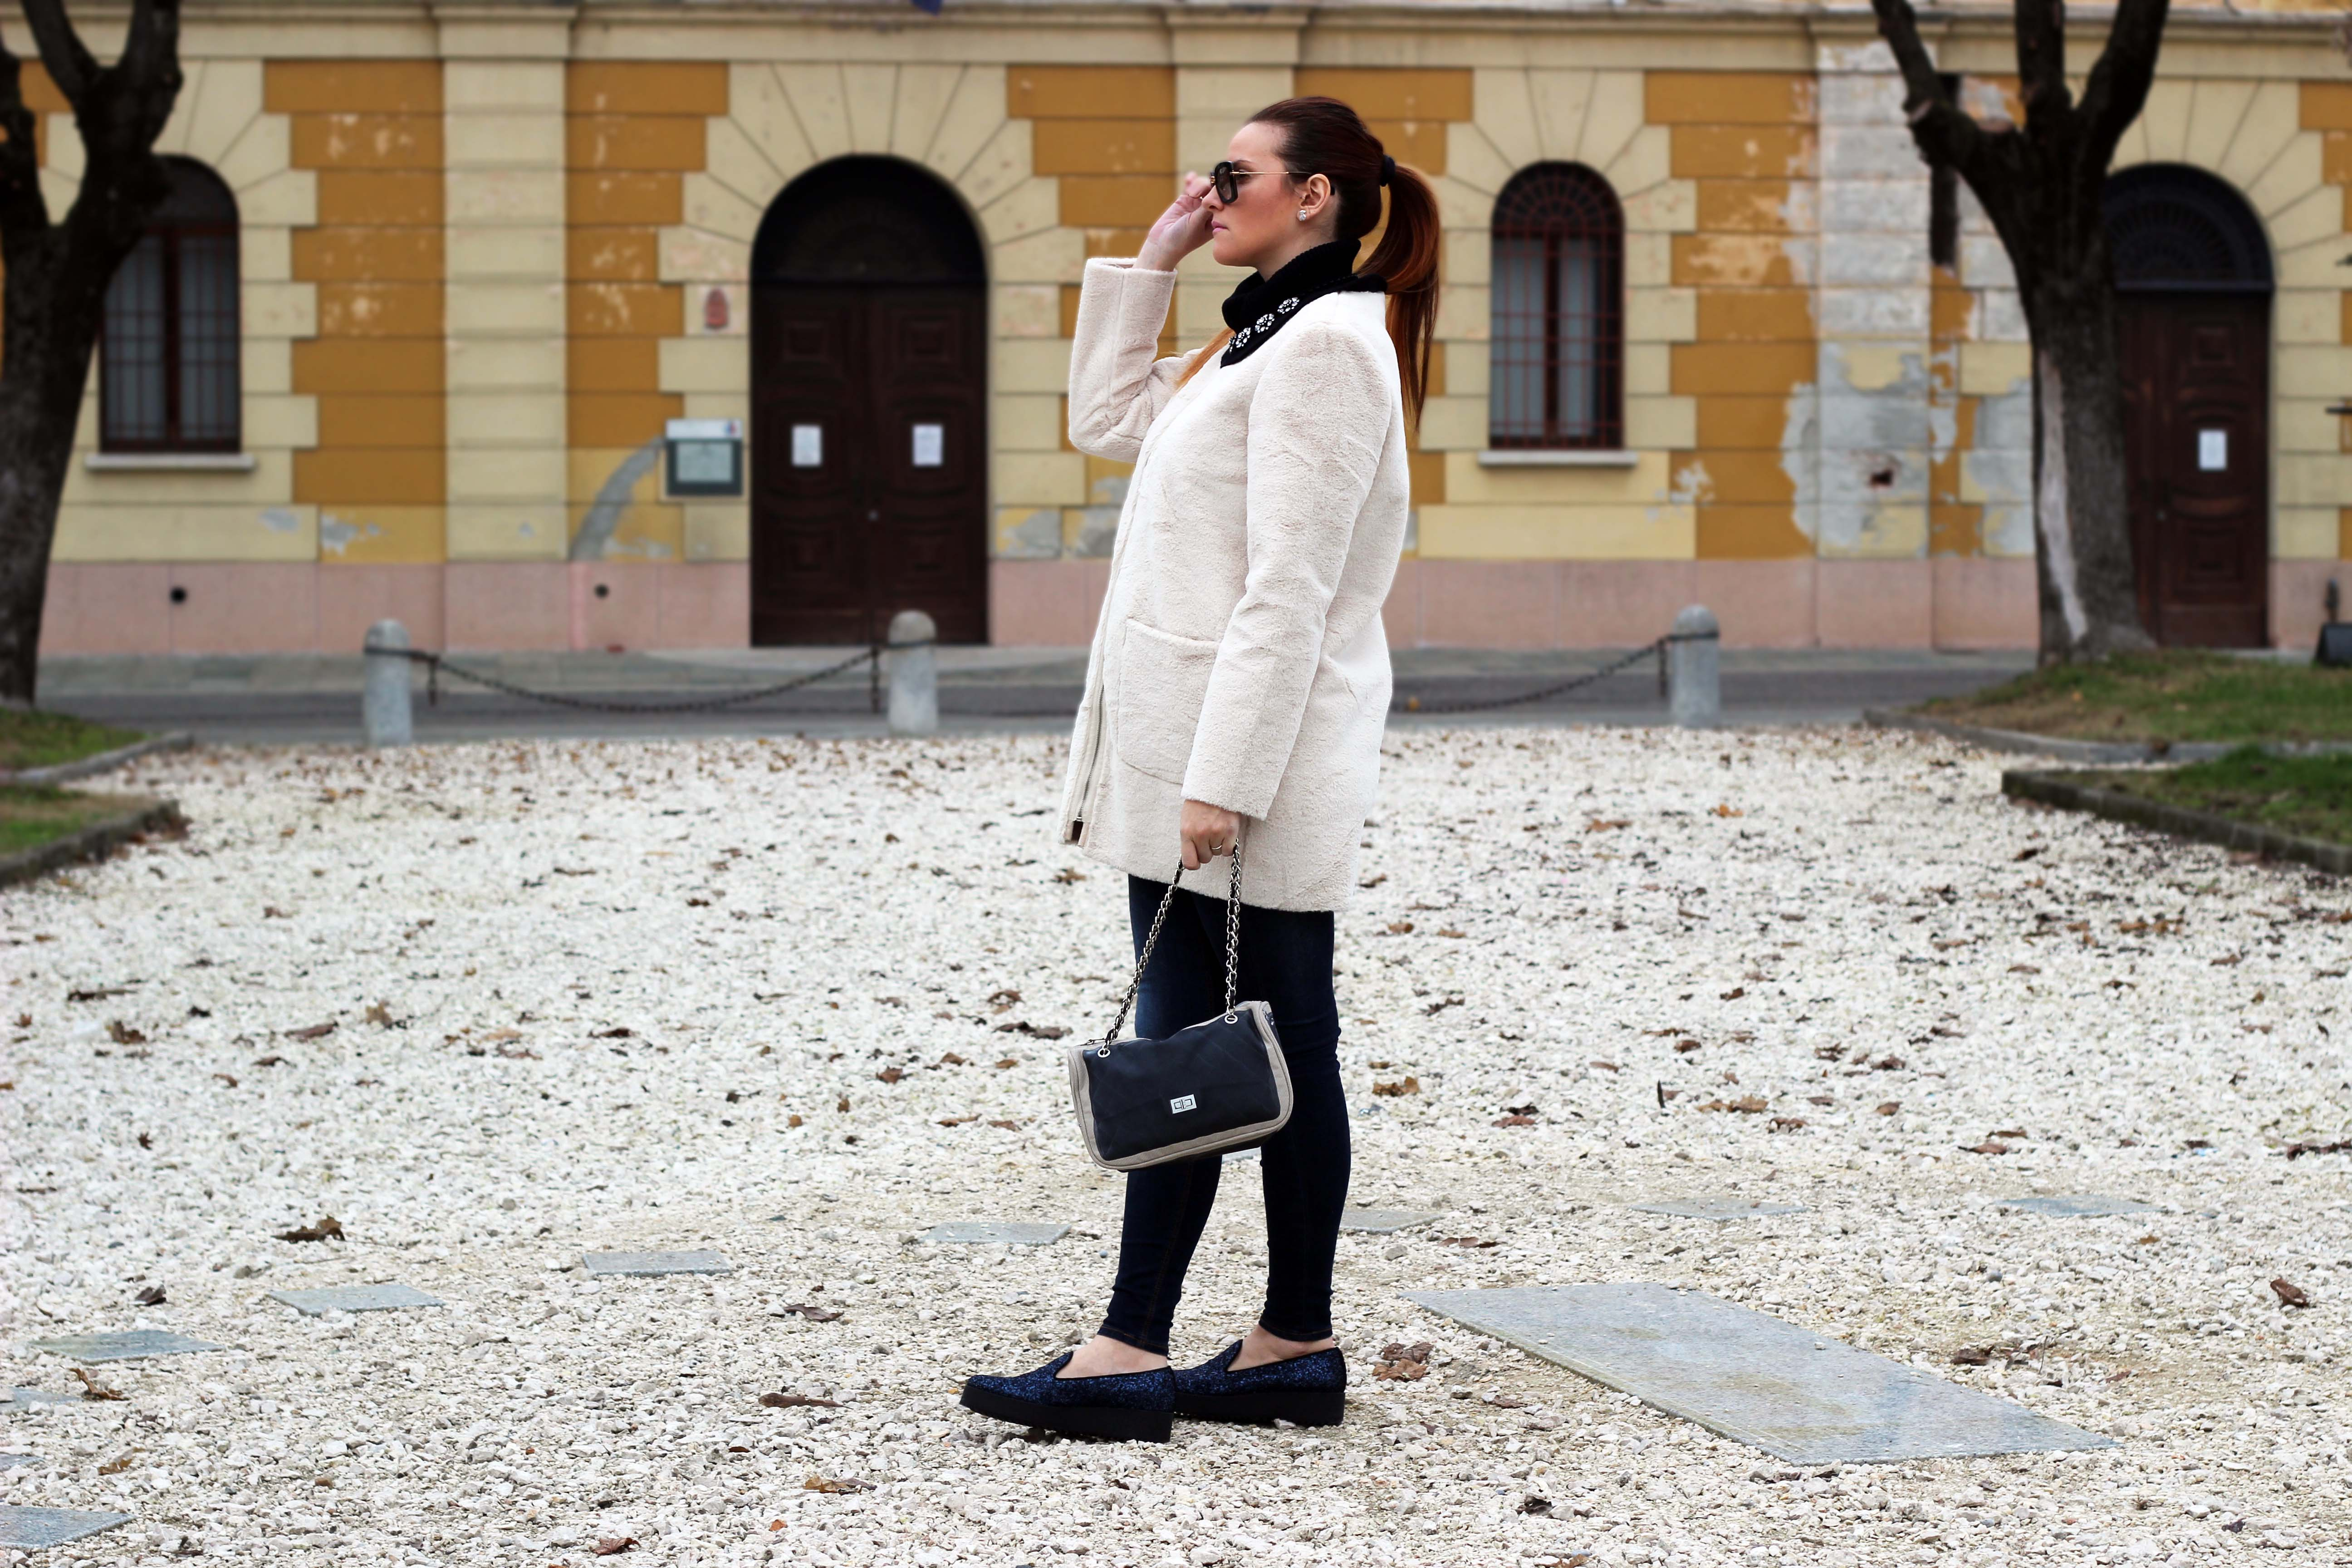 moda premaman pelliccia bianca primark borsa pomikaki tokio glittering shoes 181